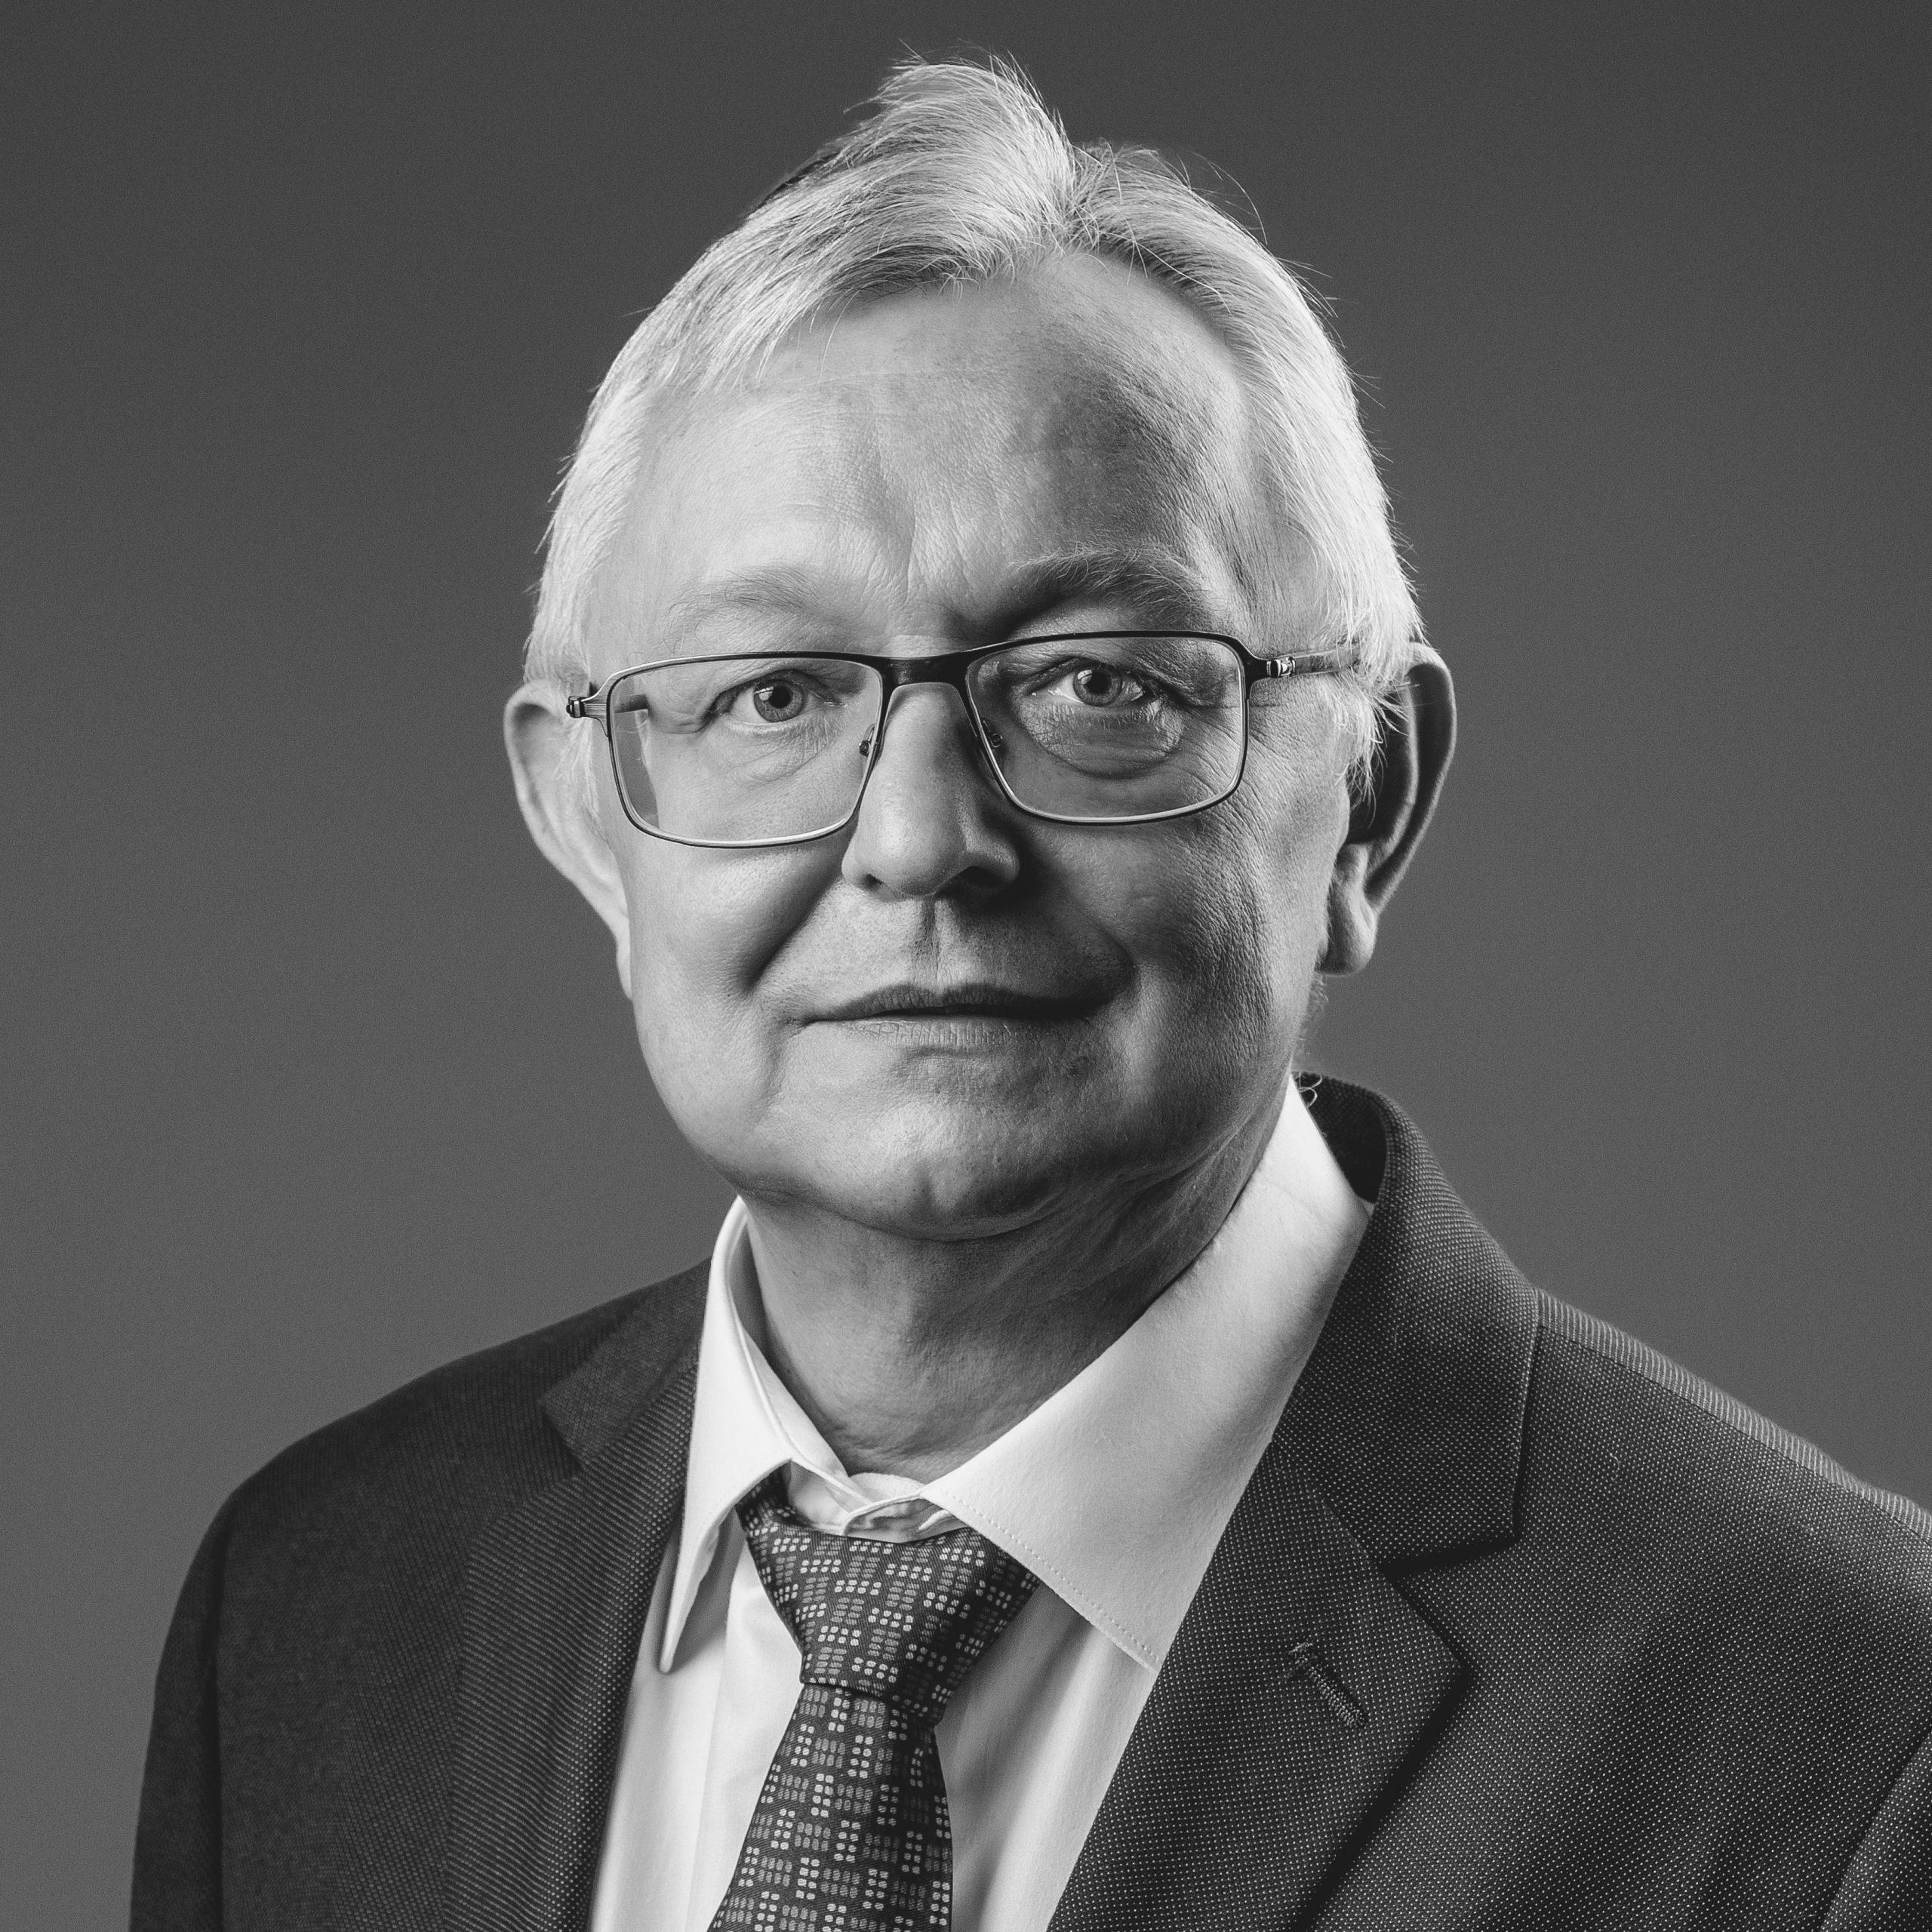 Дмитрий Канарейкин